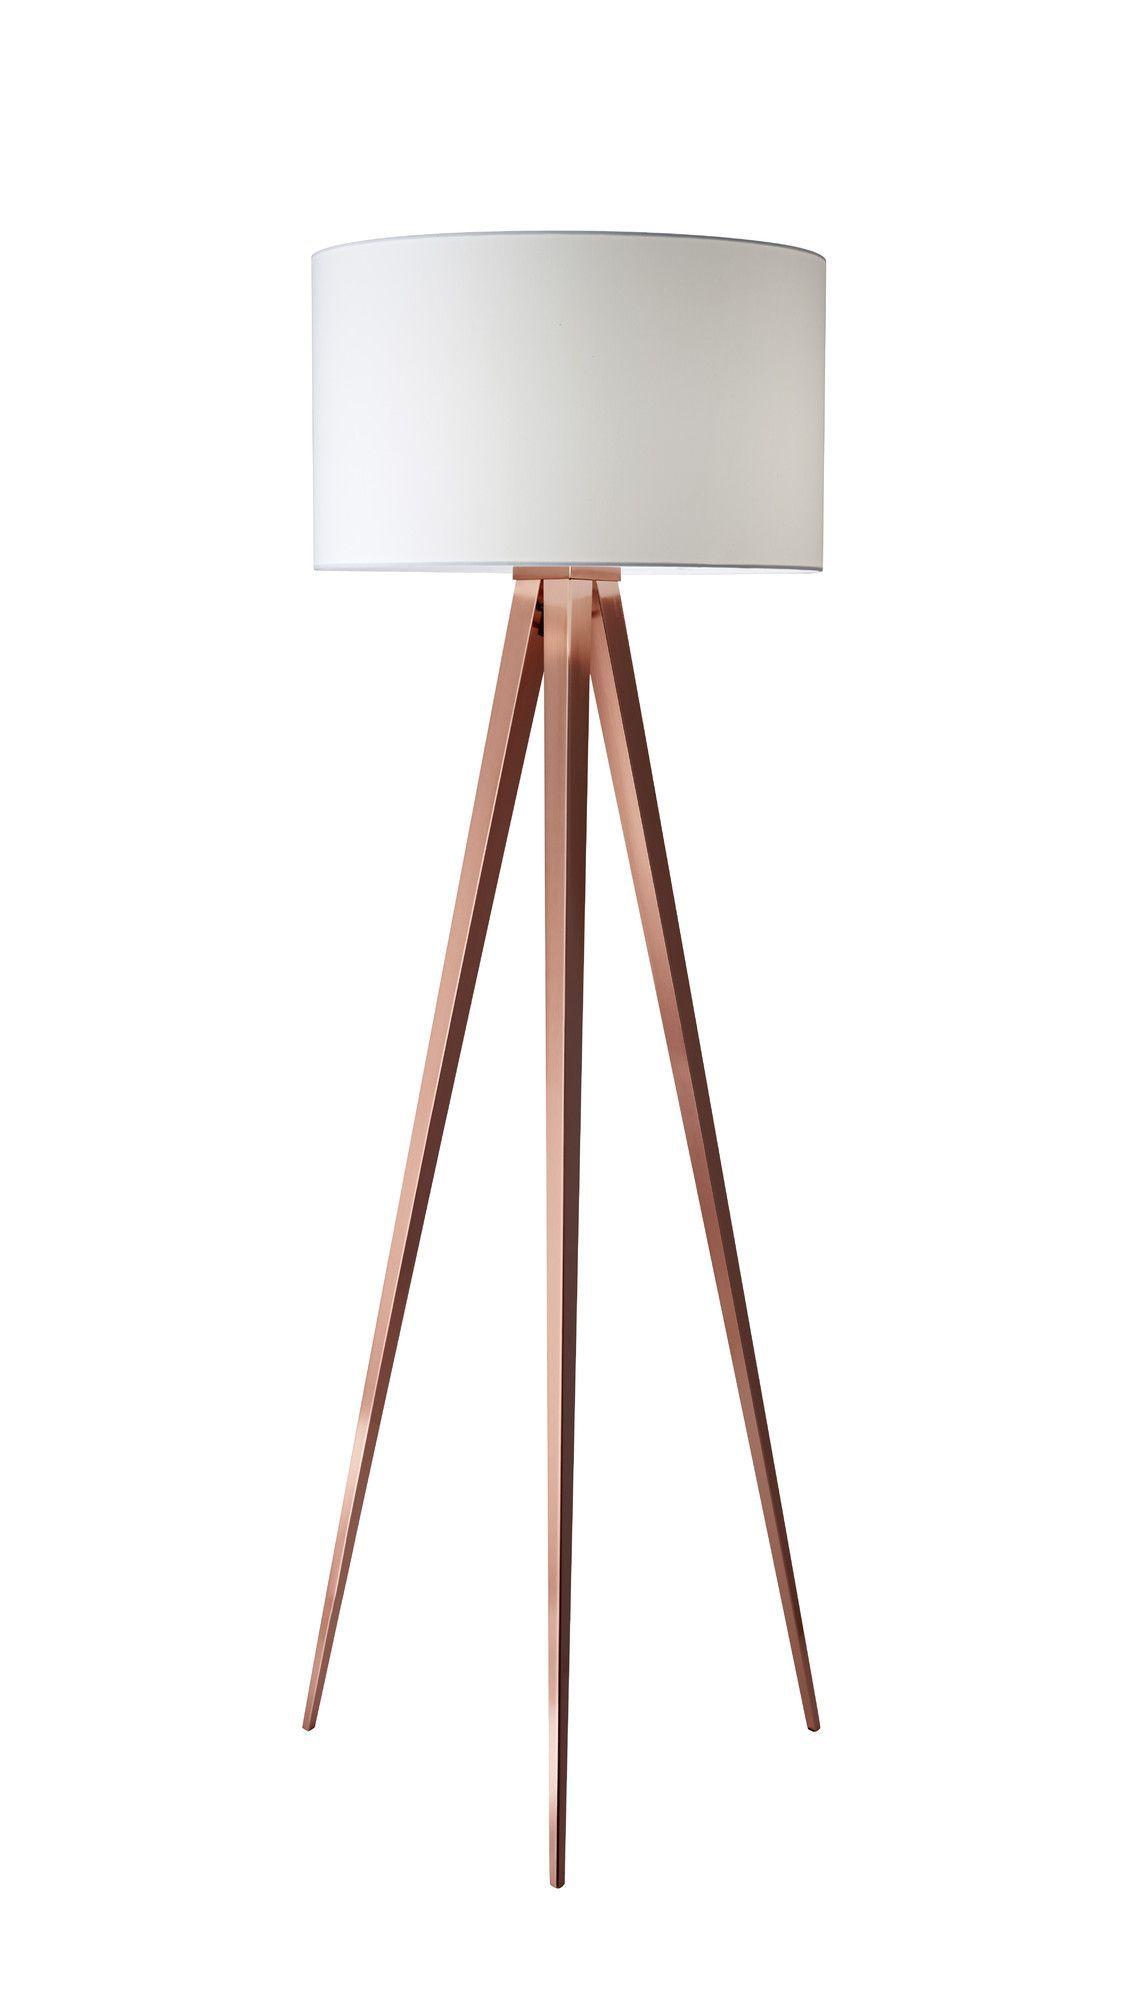 Director 60 25 Quot H Tripod Floor Lamp Tripod Floor Lamps